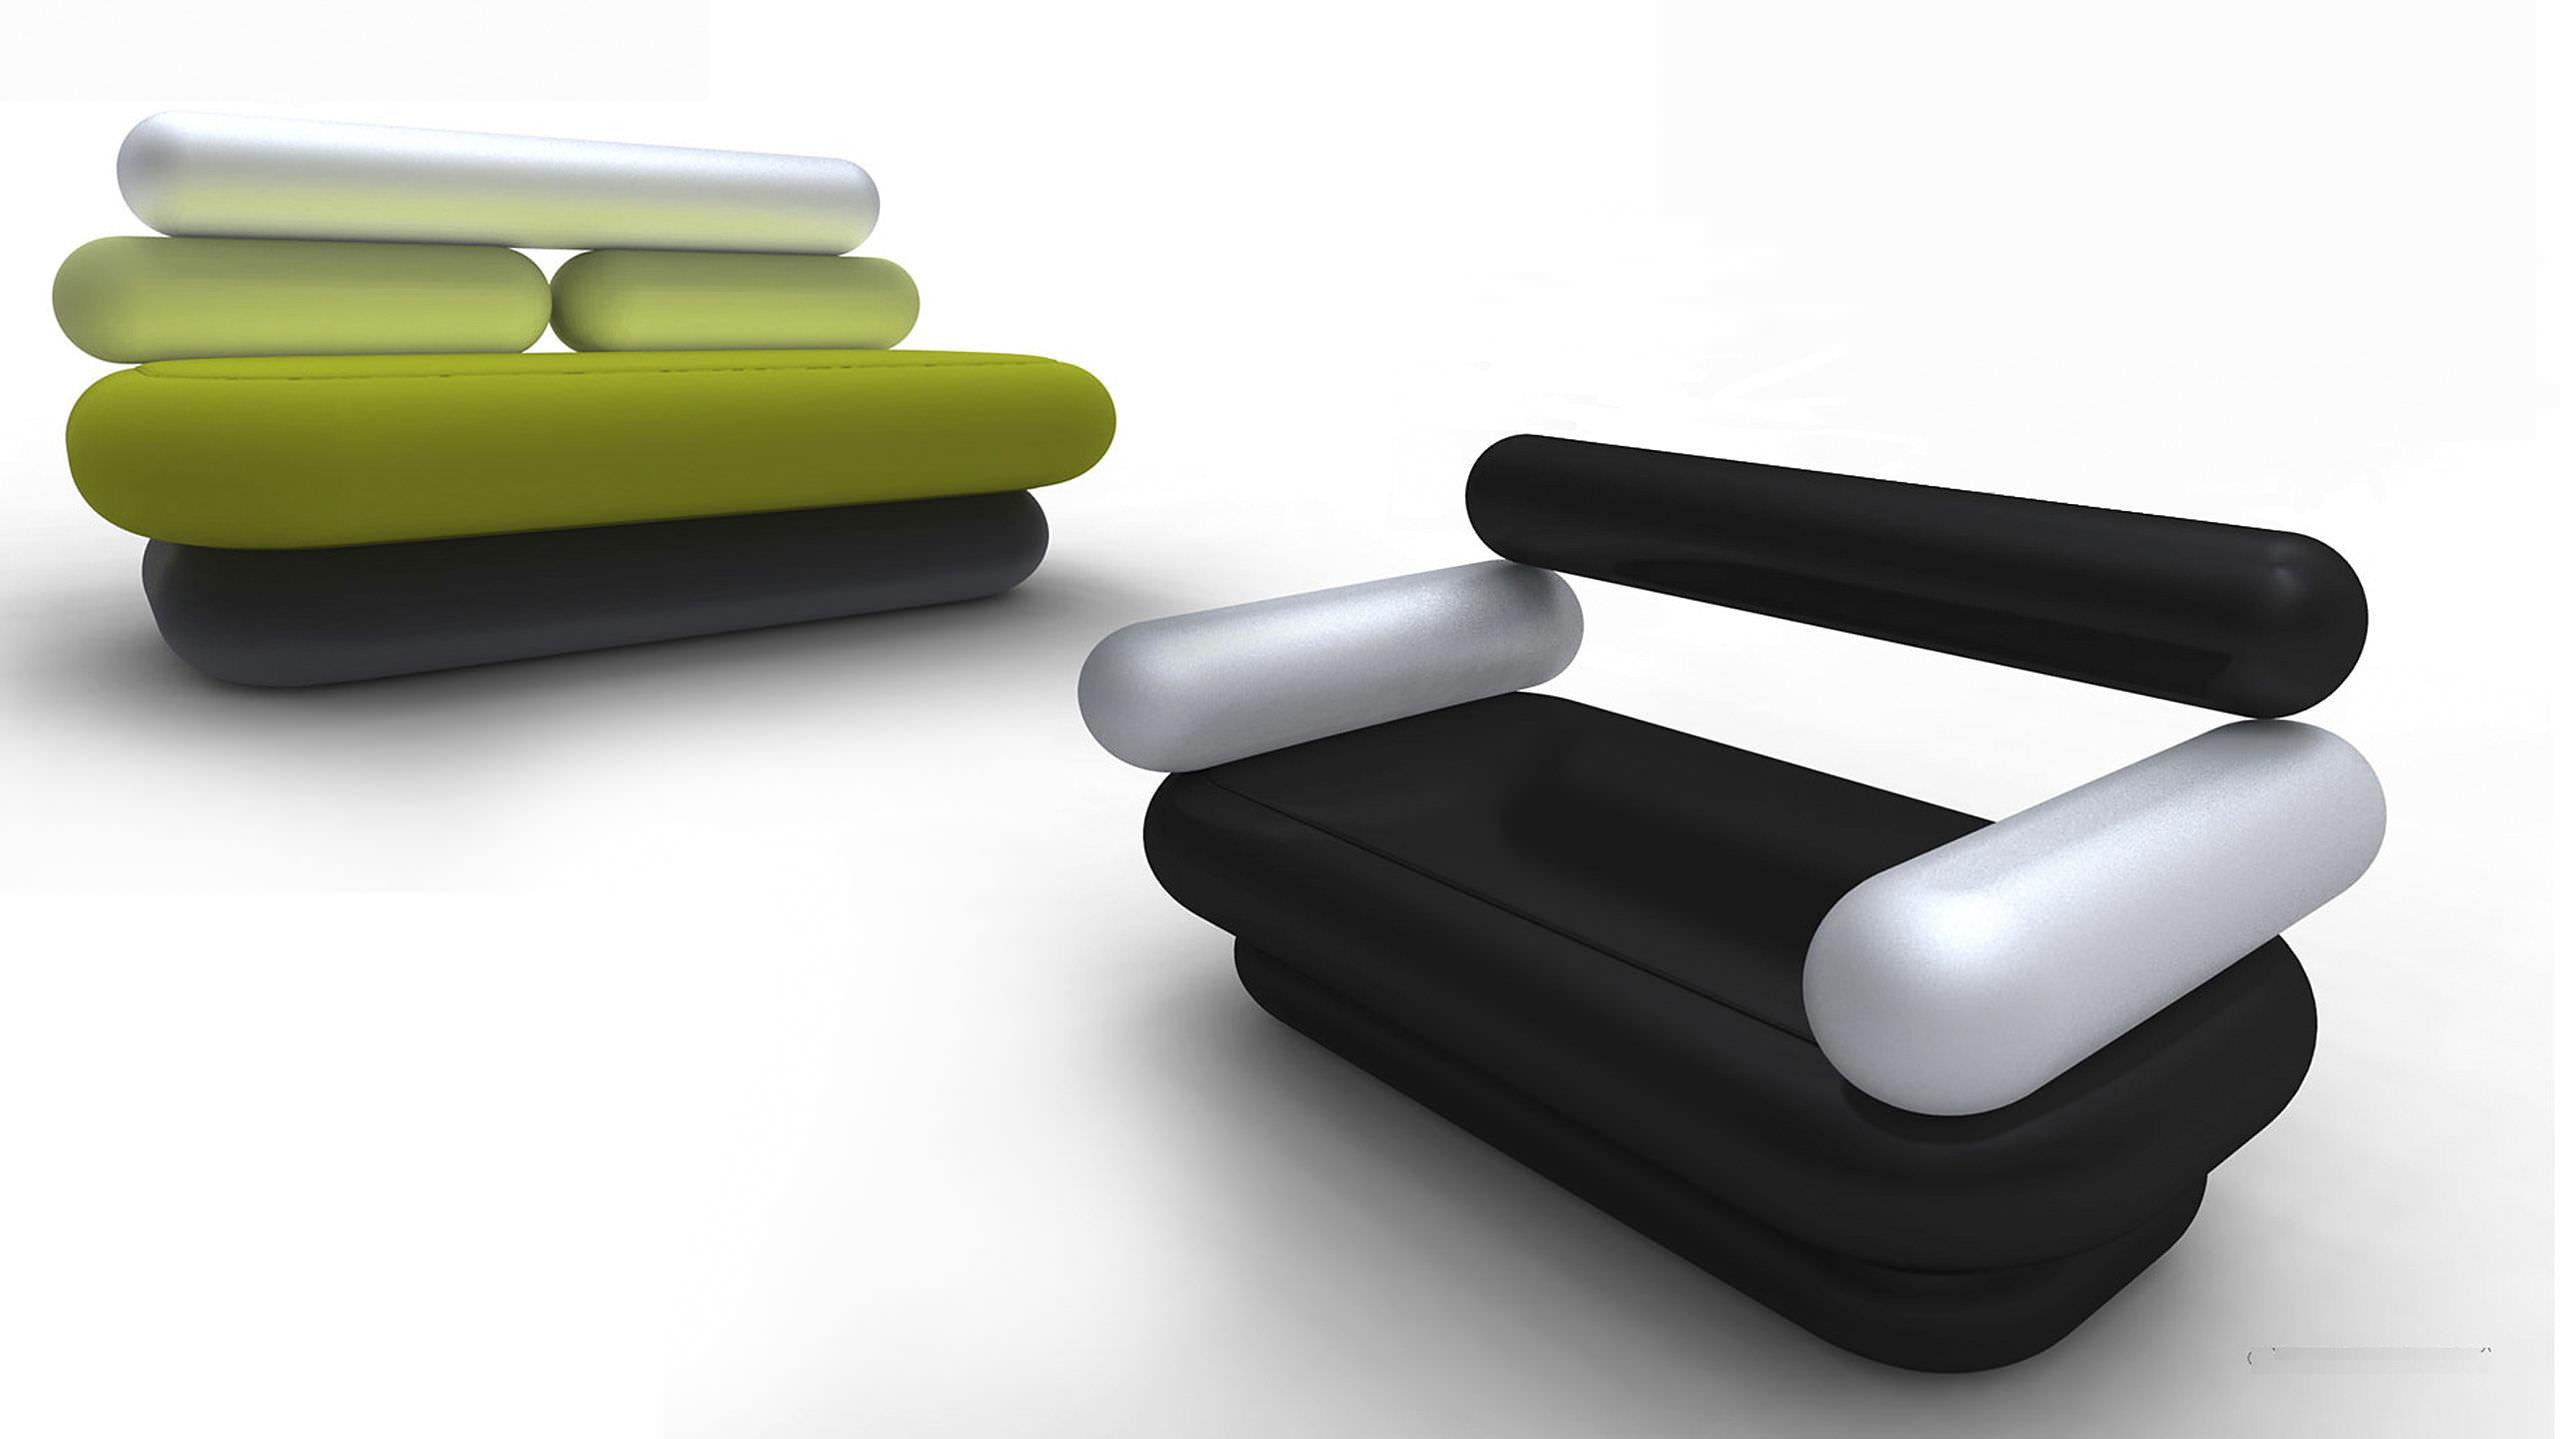 Canapé design original en tissu par Karim Rashid 2 places